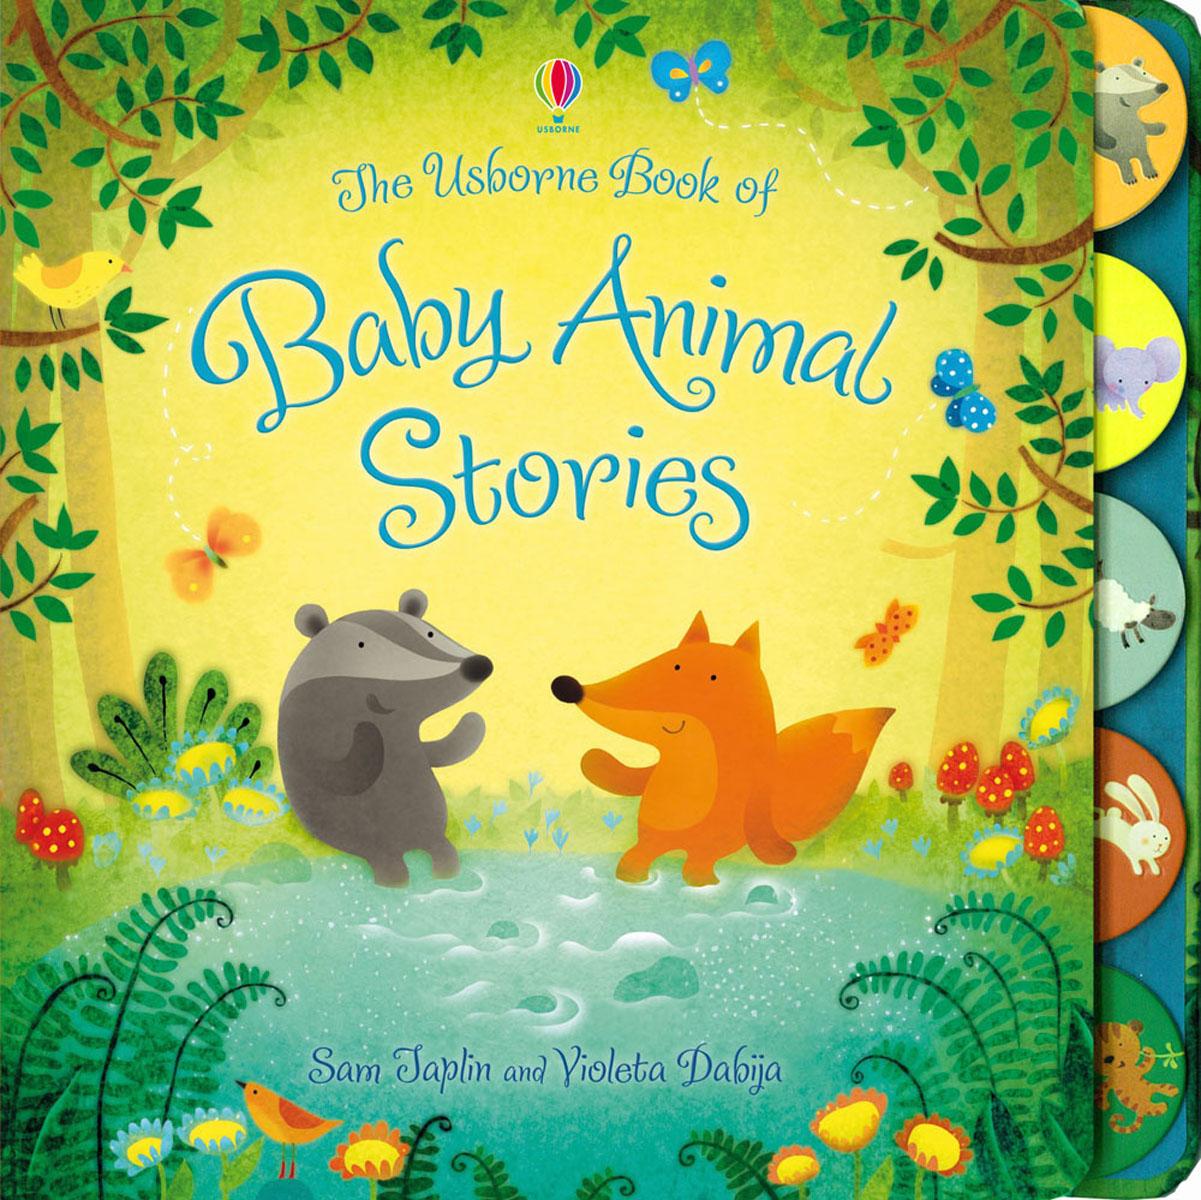 Baby Animal Stories little rabbit animal series many chew toy